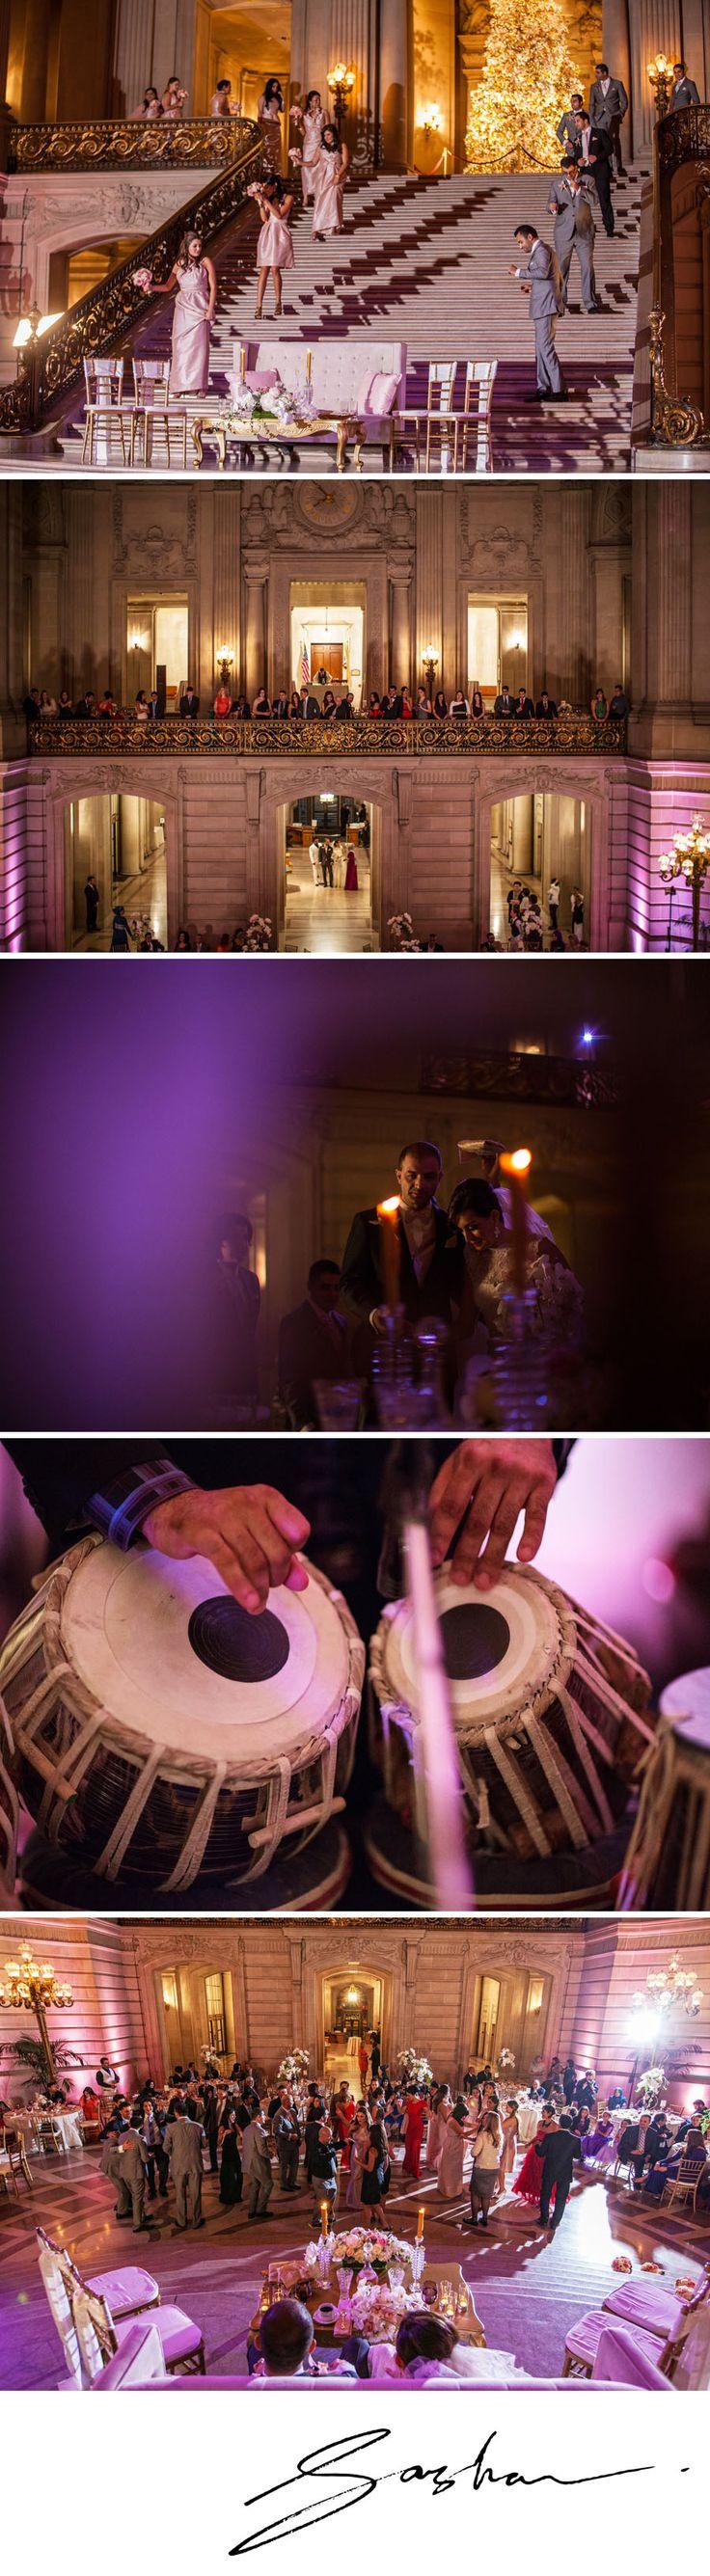 san-francisco-city-hall-afghan-wedding-003